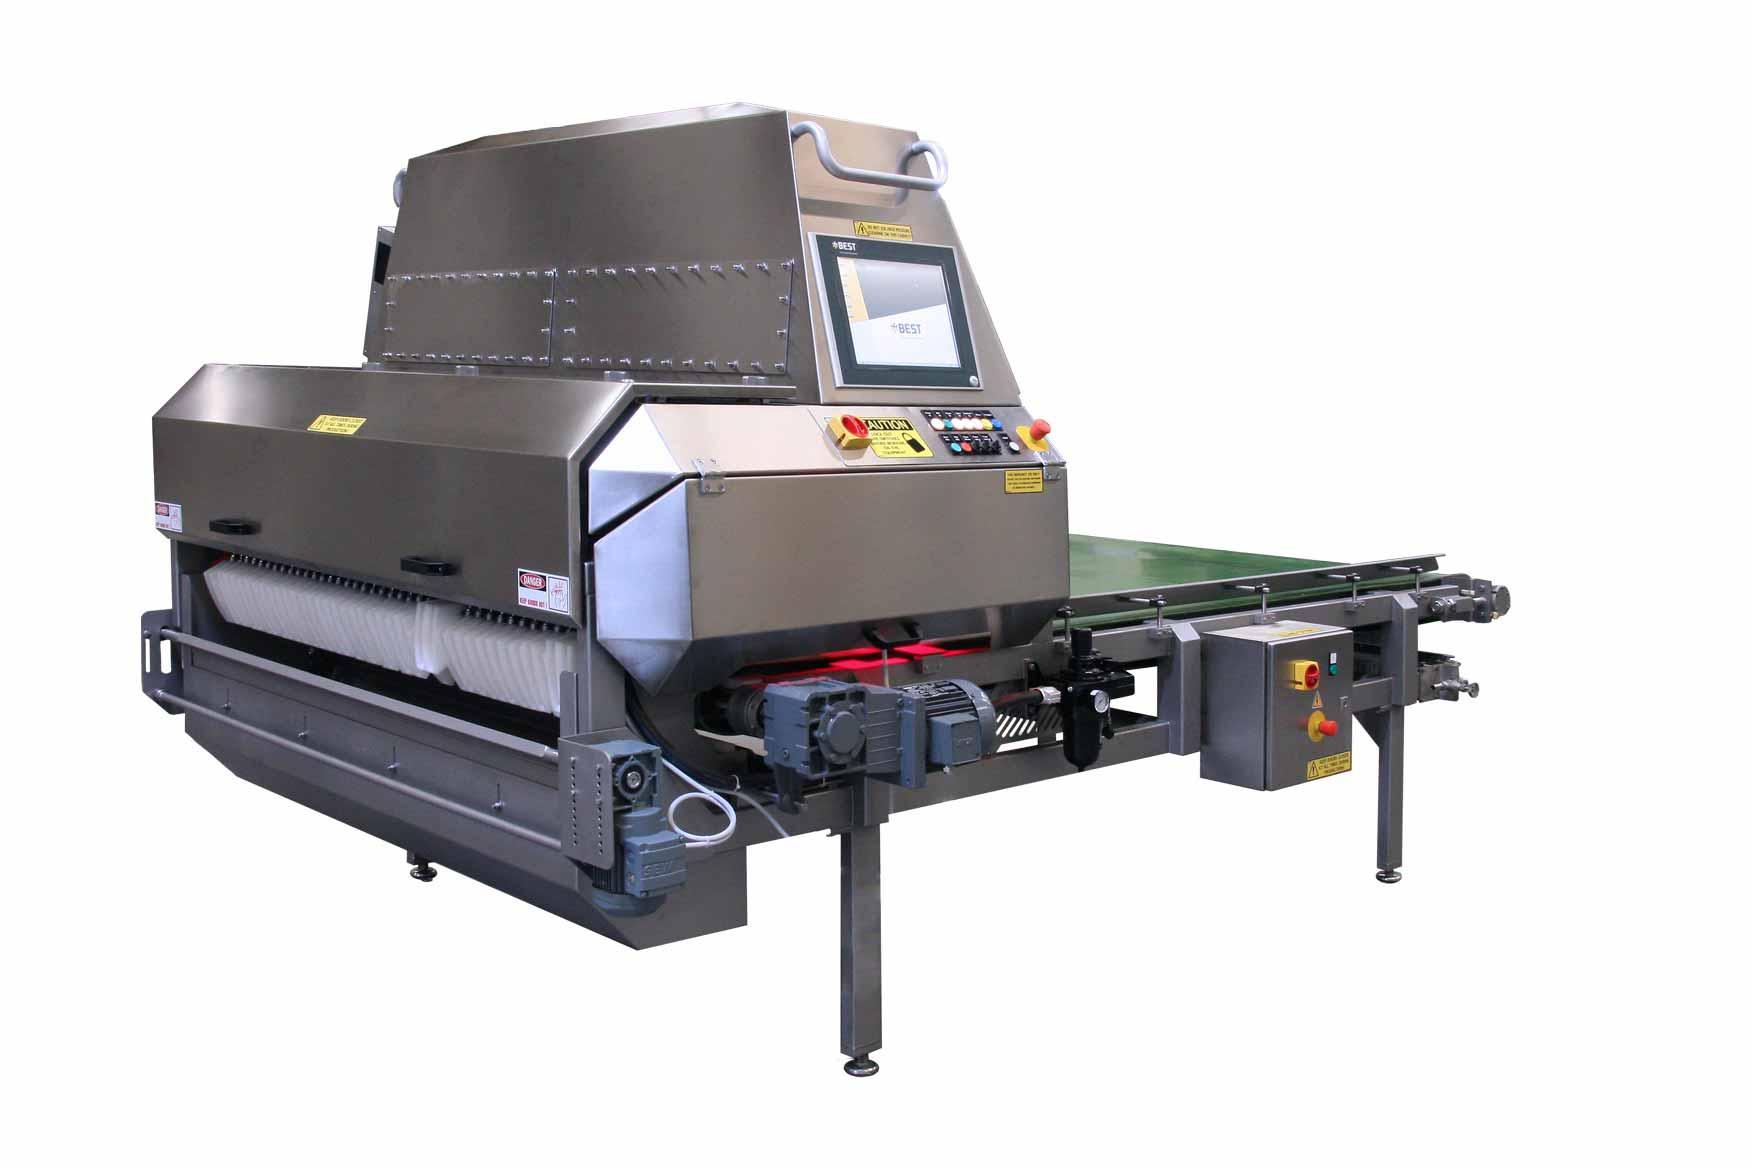 Felix-سورتر Felix-دستگاه سورتینگ-سورتینگ لوبیا سبز-سورتر لوبیا سبز-Tomra sorting machine-